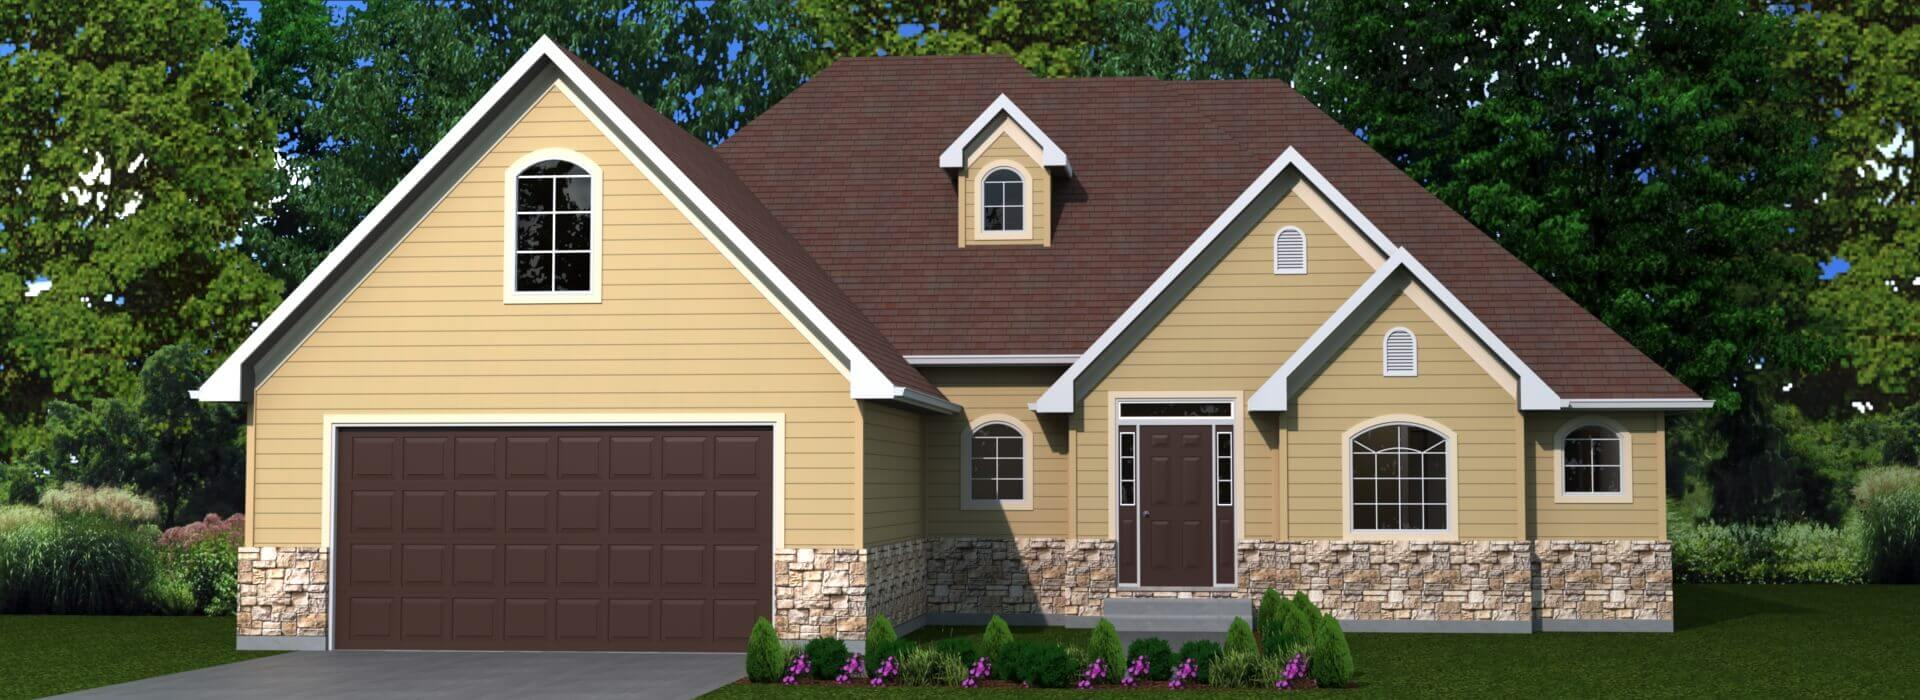 1995 house elevation